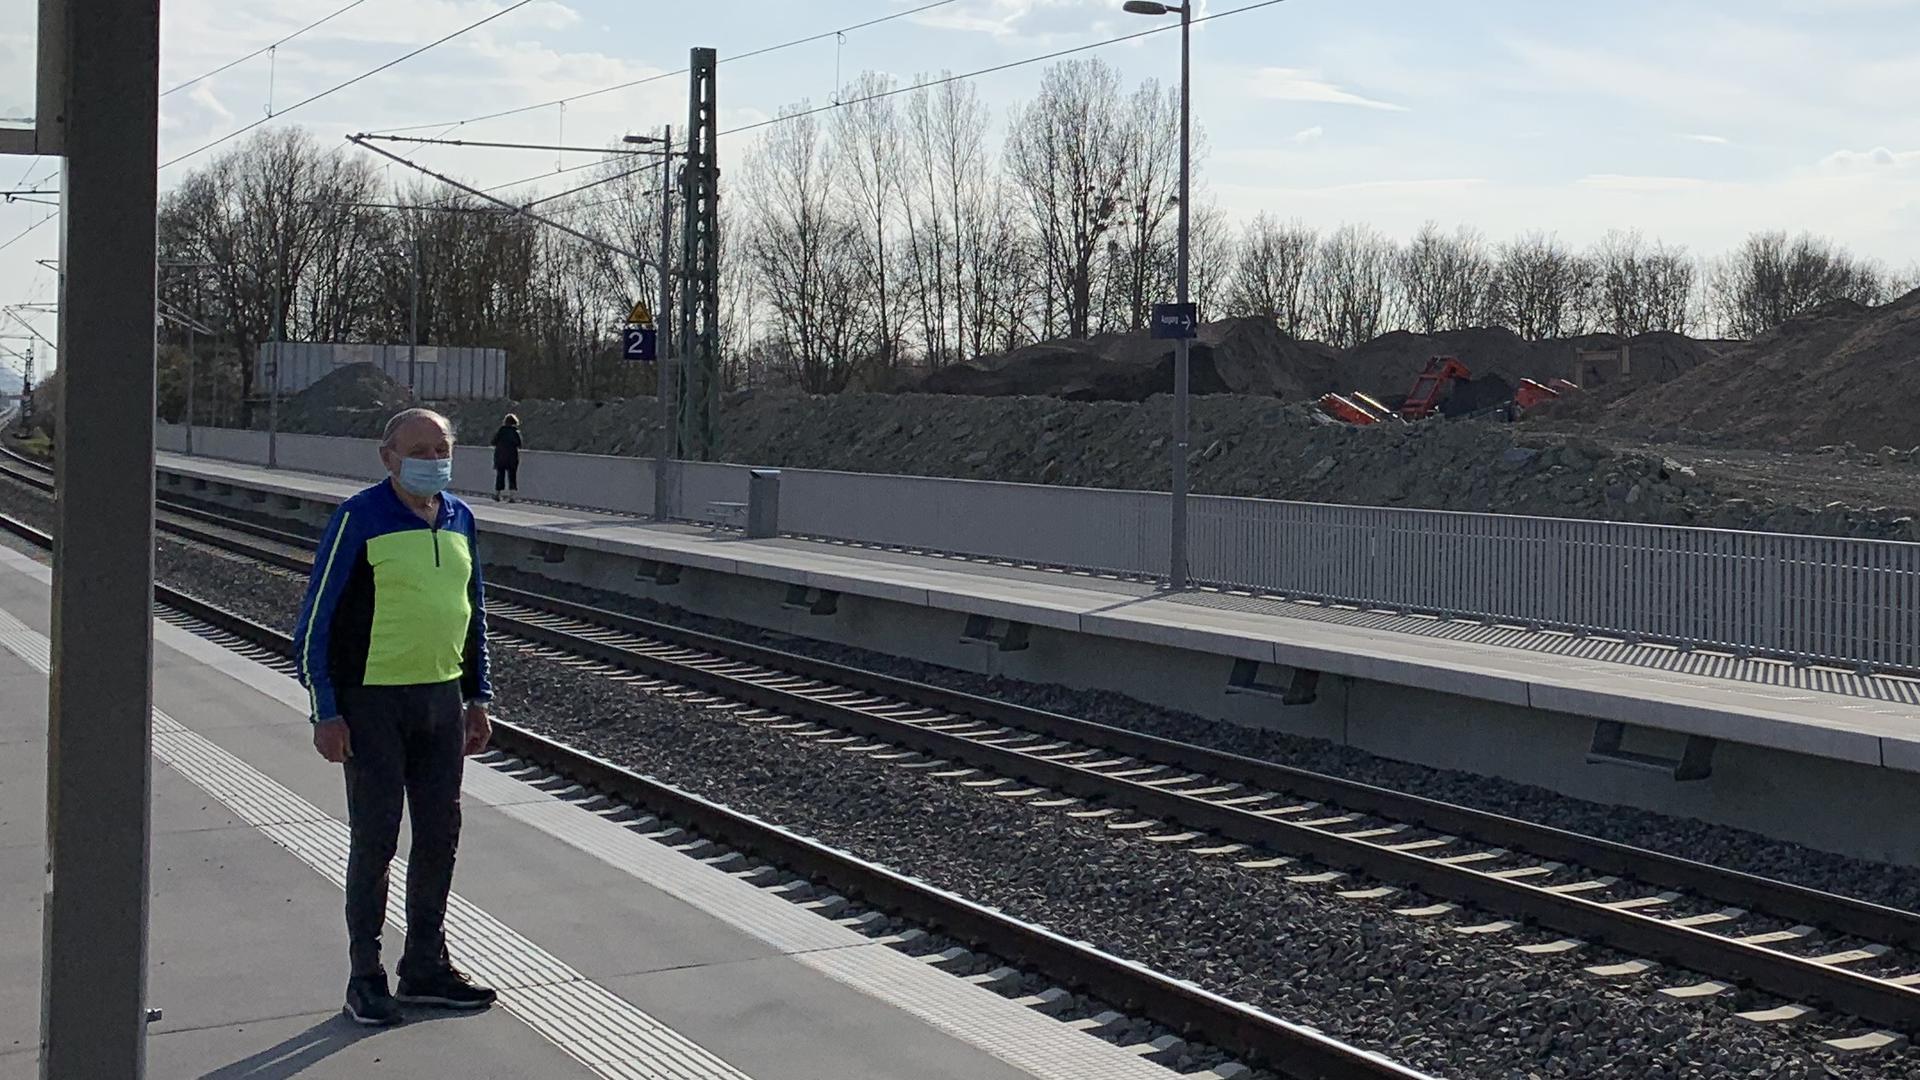 Mann in Fahrradkleidung am Bahnsteig